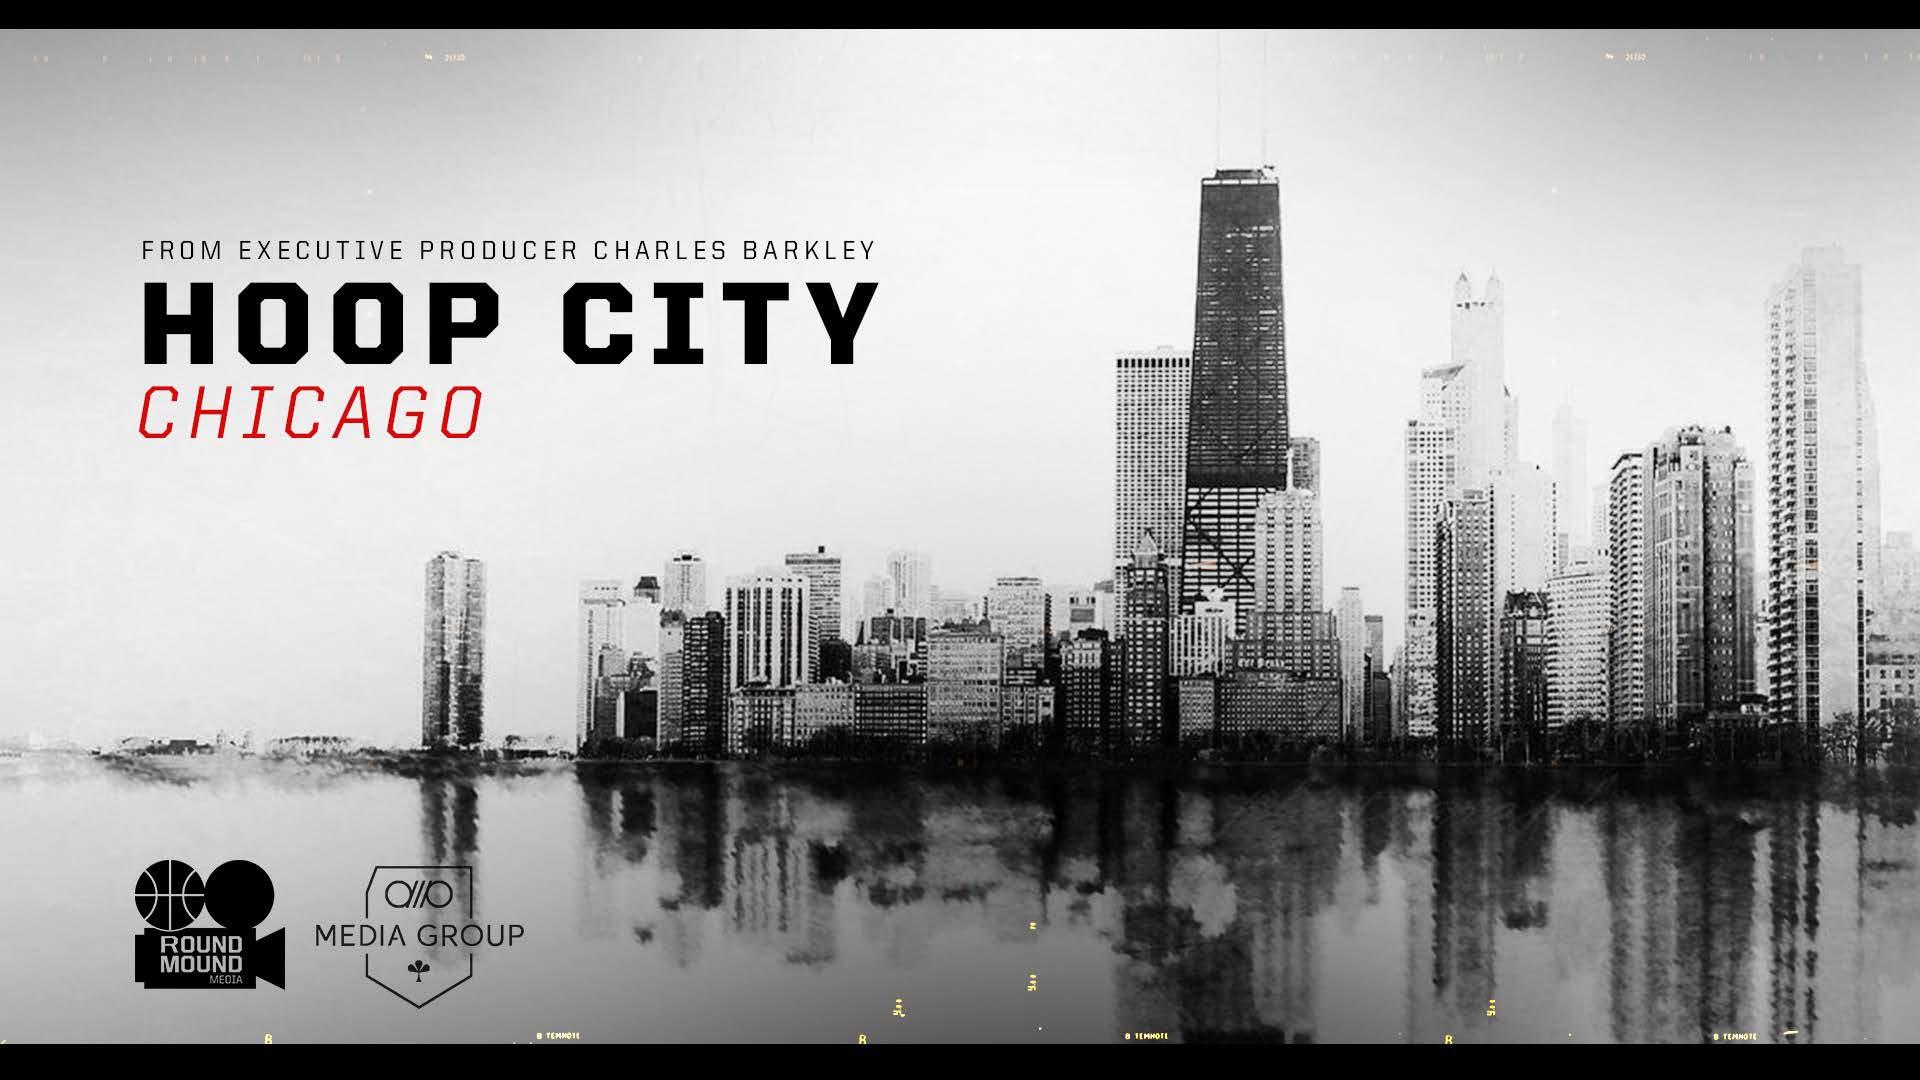 DLP_HoopCity(Chicago)_v1_Page_01.jpg